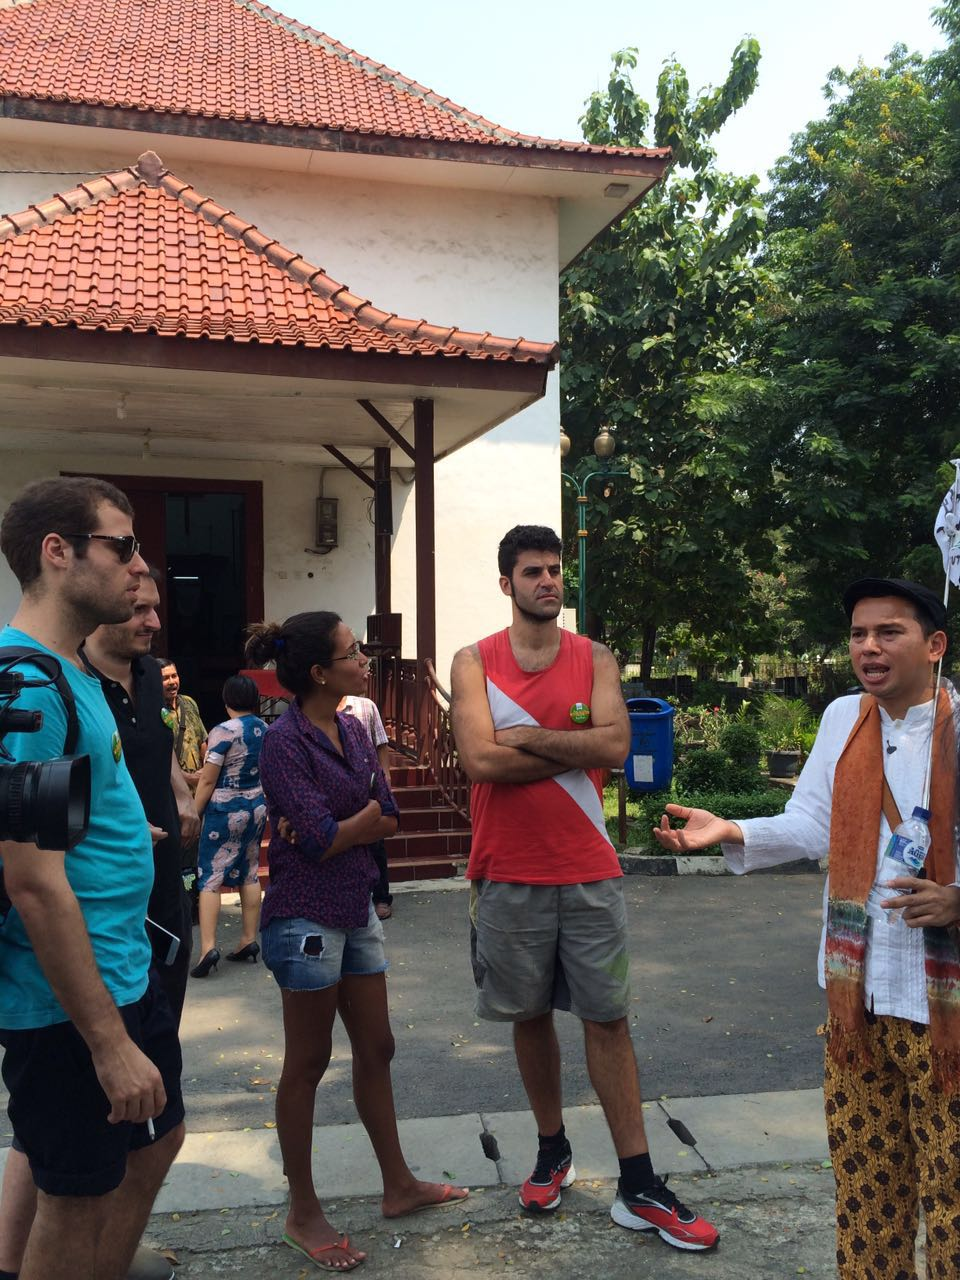 Wisata Jakarta Ada Jejak Portugis Di Kampung Tugu Oleh Sutiono